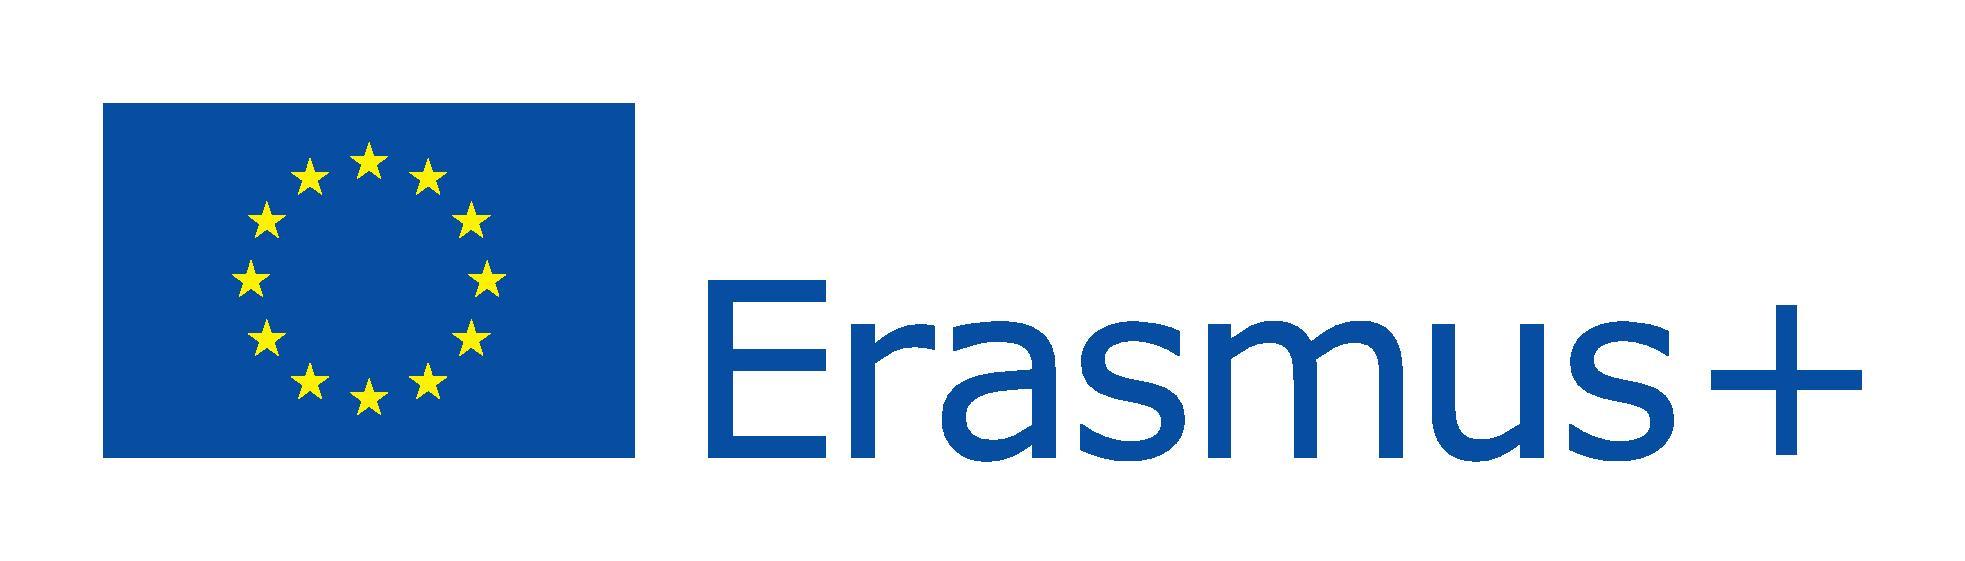 Projekt Erasmus